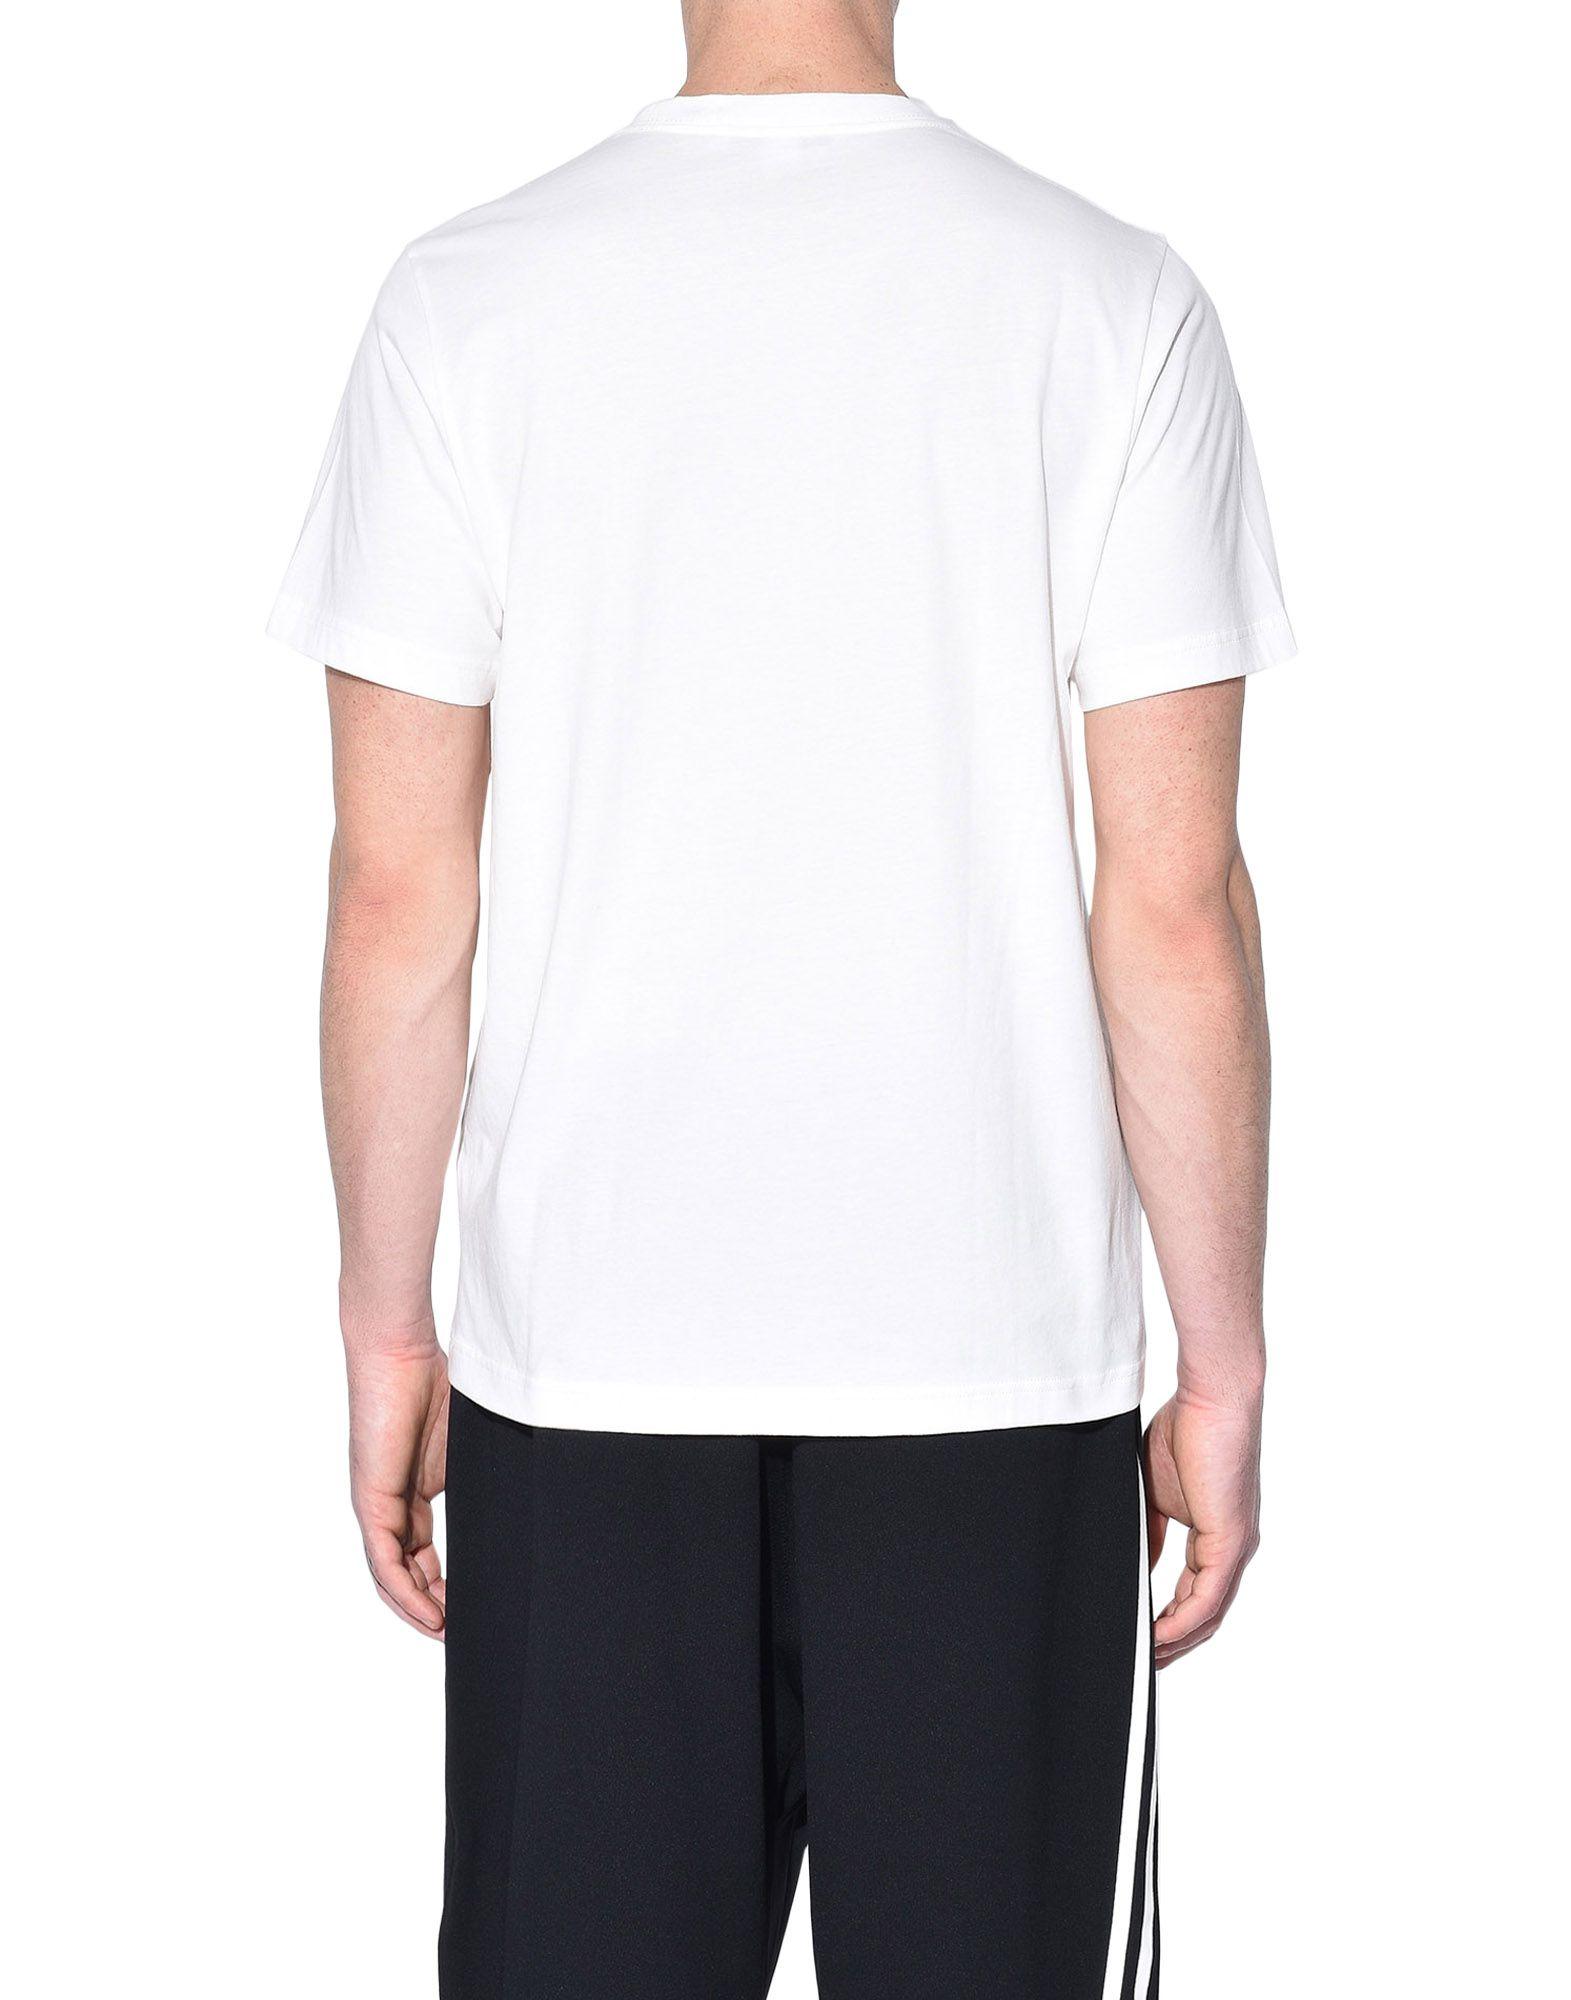 Y-3 Y-3 Classic Tee Short sleeve t-shirt Man d